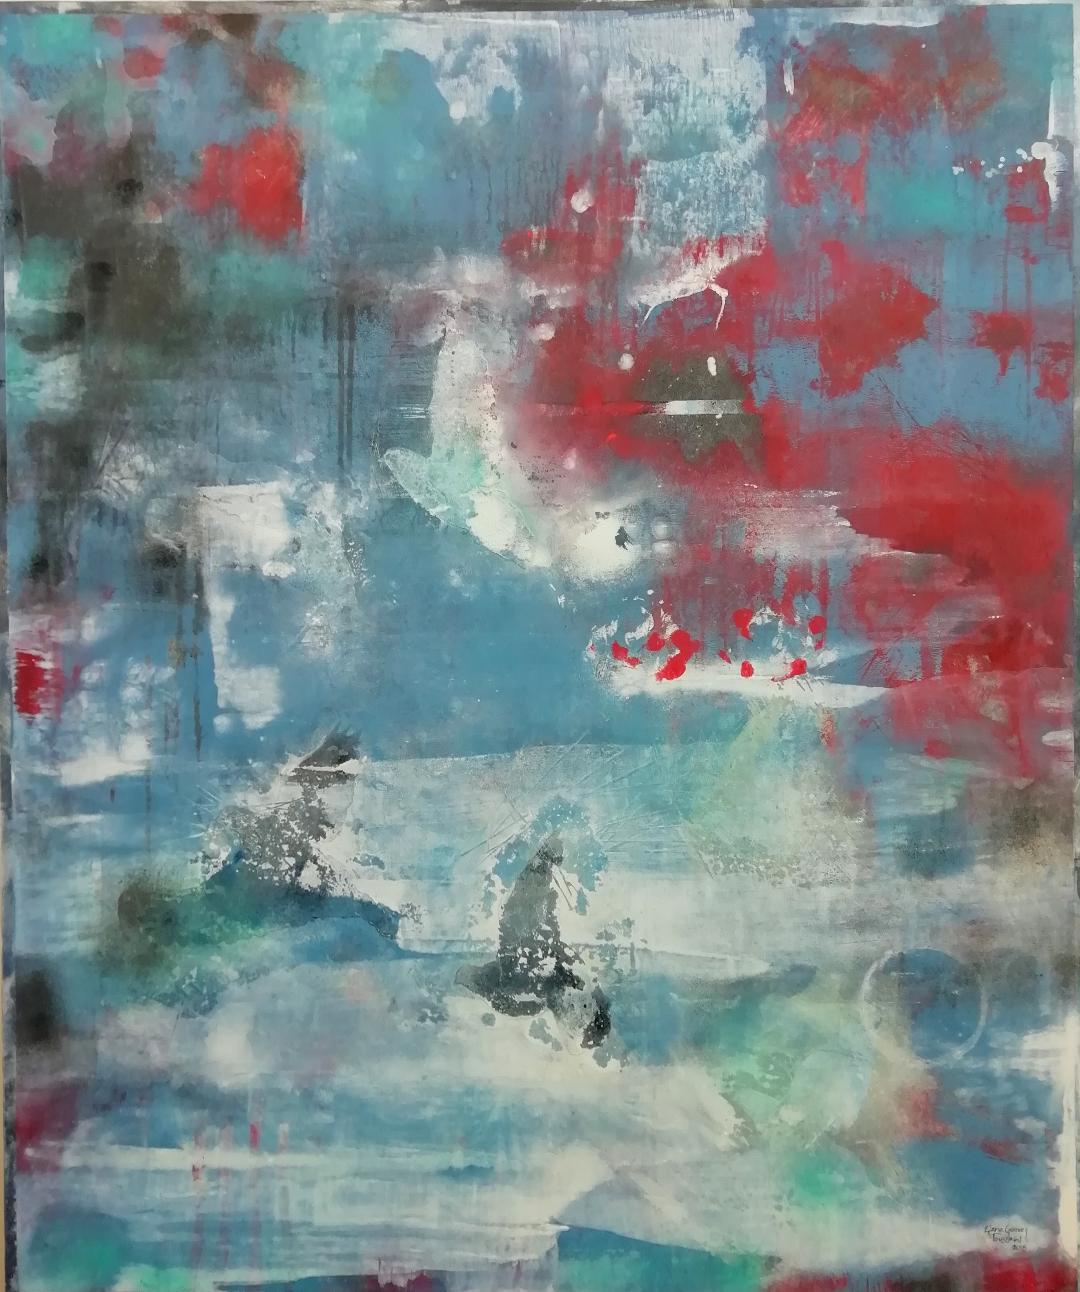 De la serie homenaje a Monet Acrílico, grafito y pigmentos s/tela 120 x 100 cms.